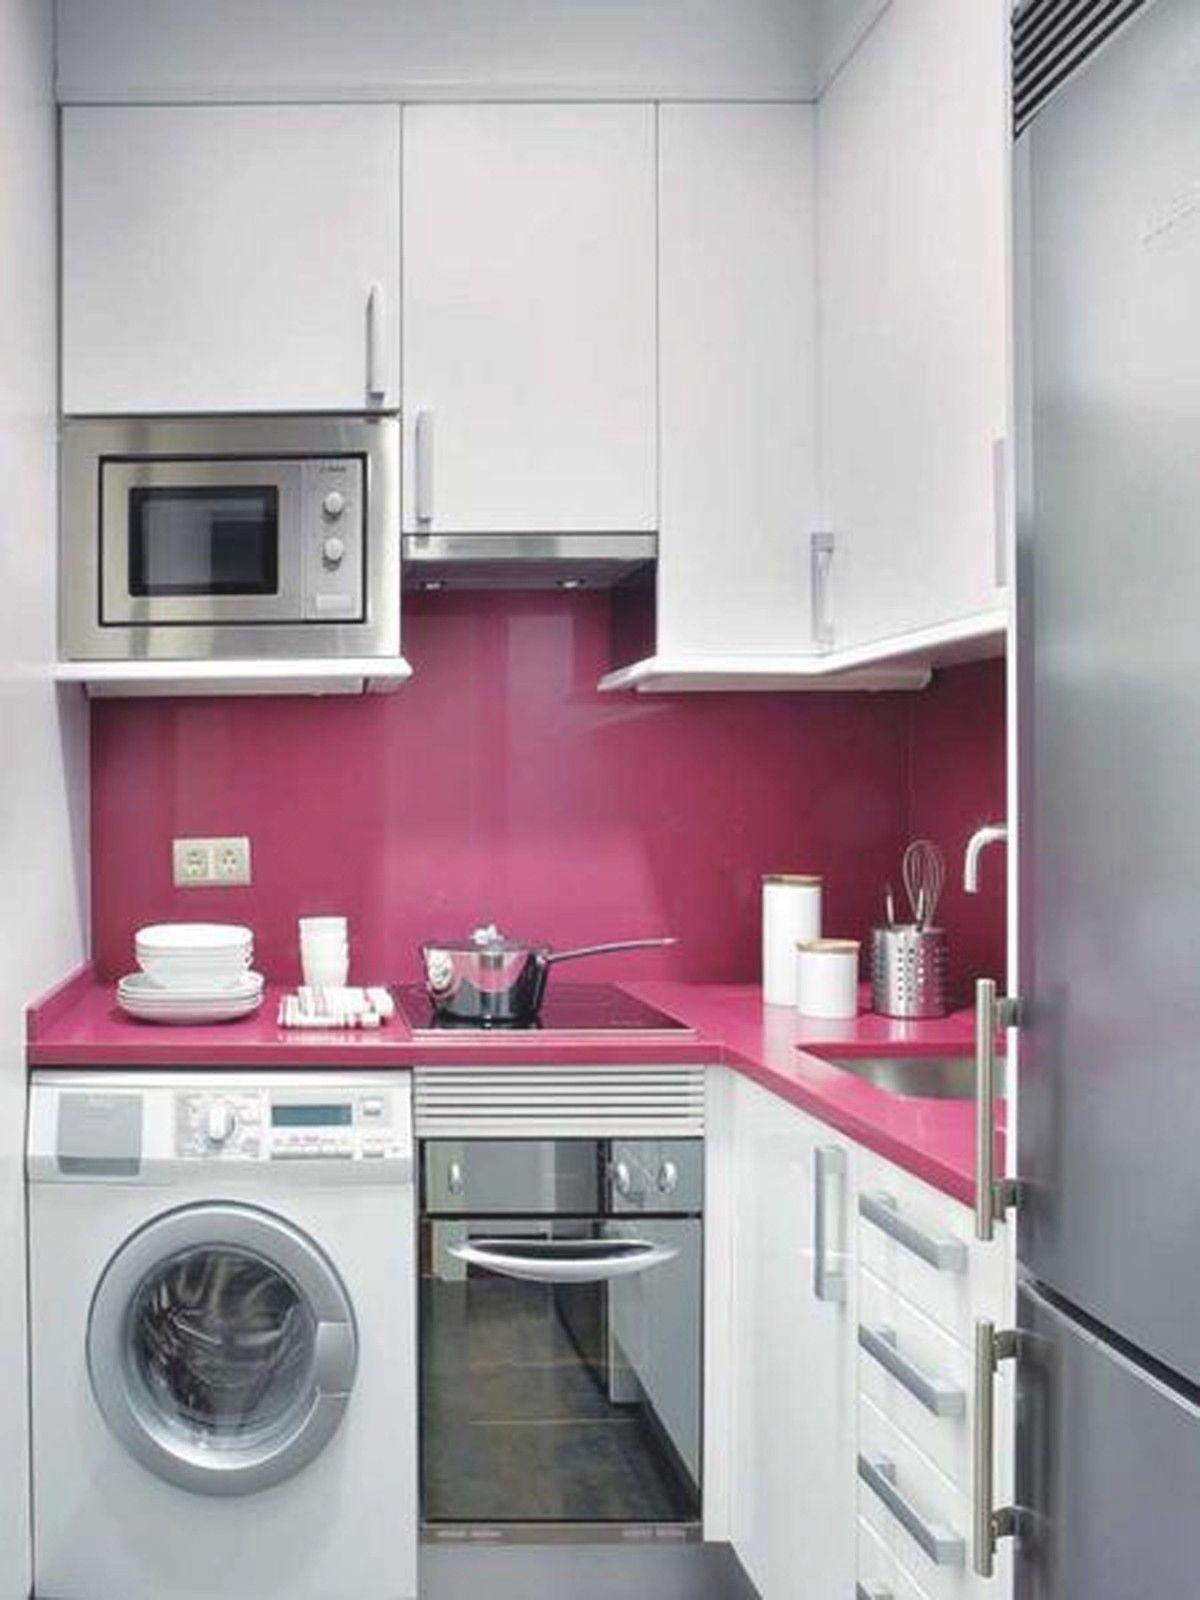 Kitchen Cabinet Design For Small Apartment   Small apartment ...